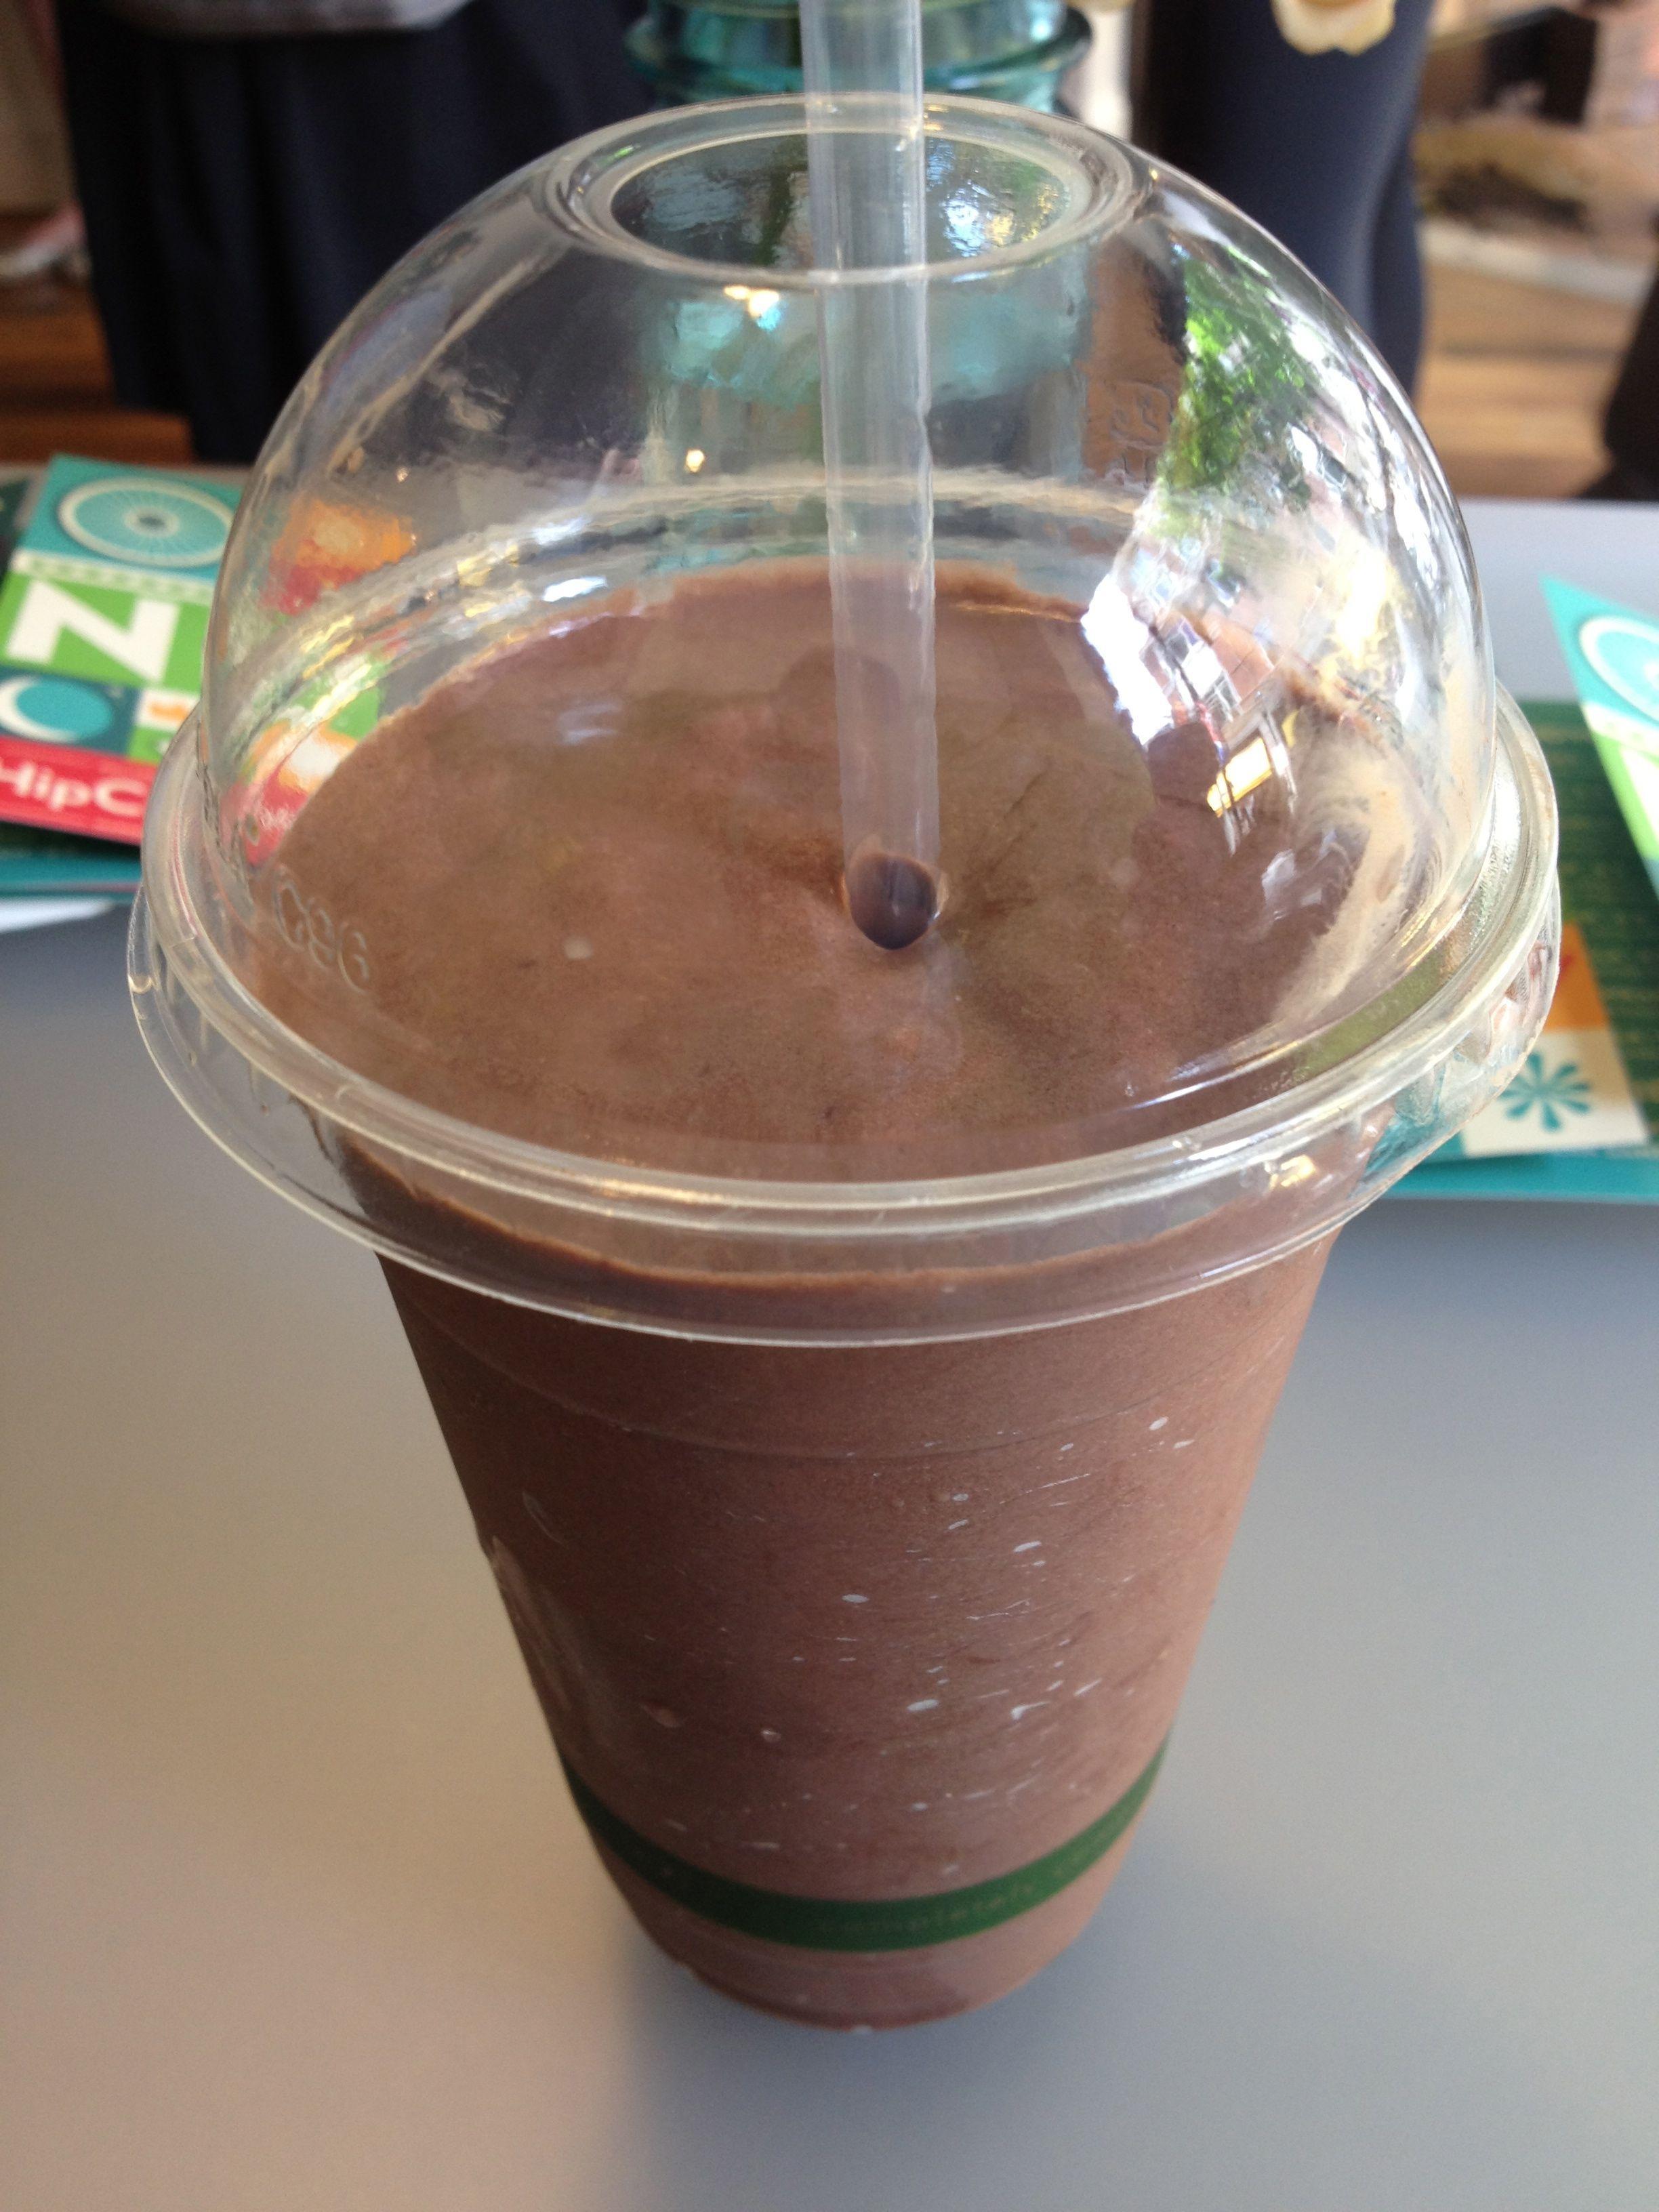 The chocolate shake is delightful and tastes like chocolate ...